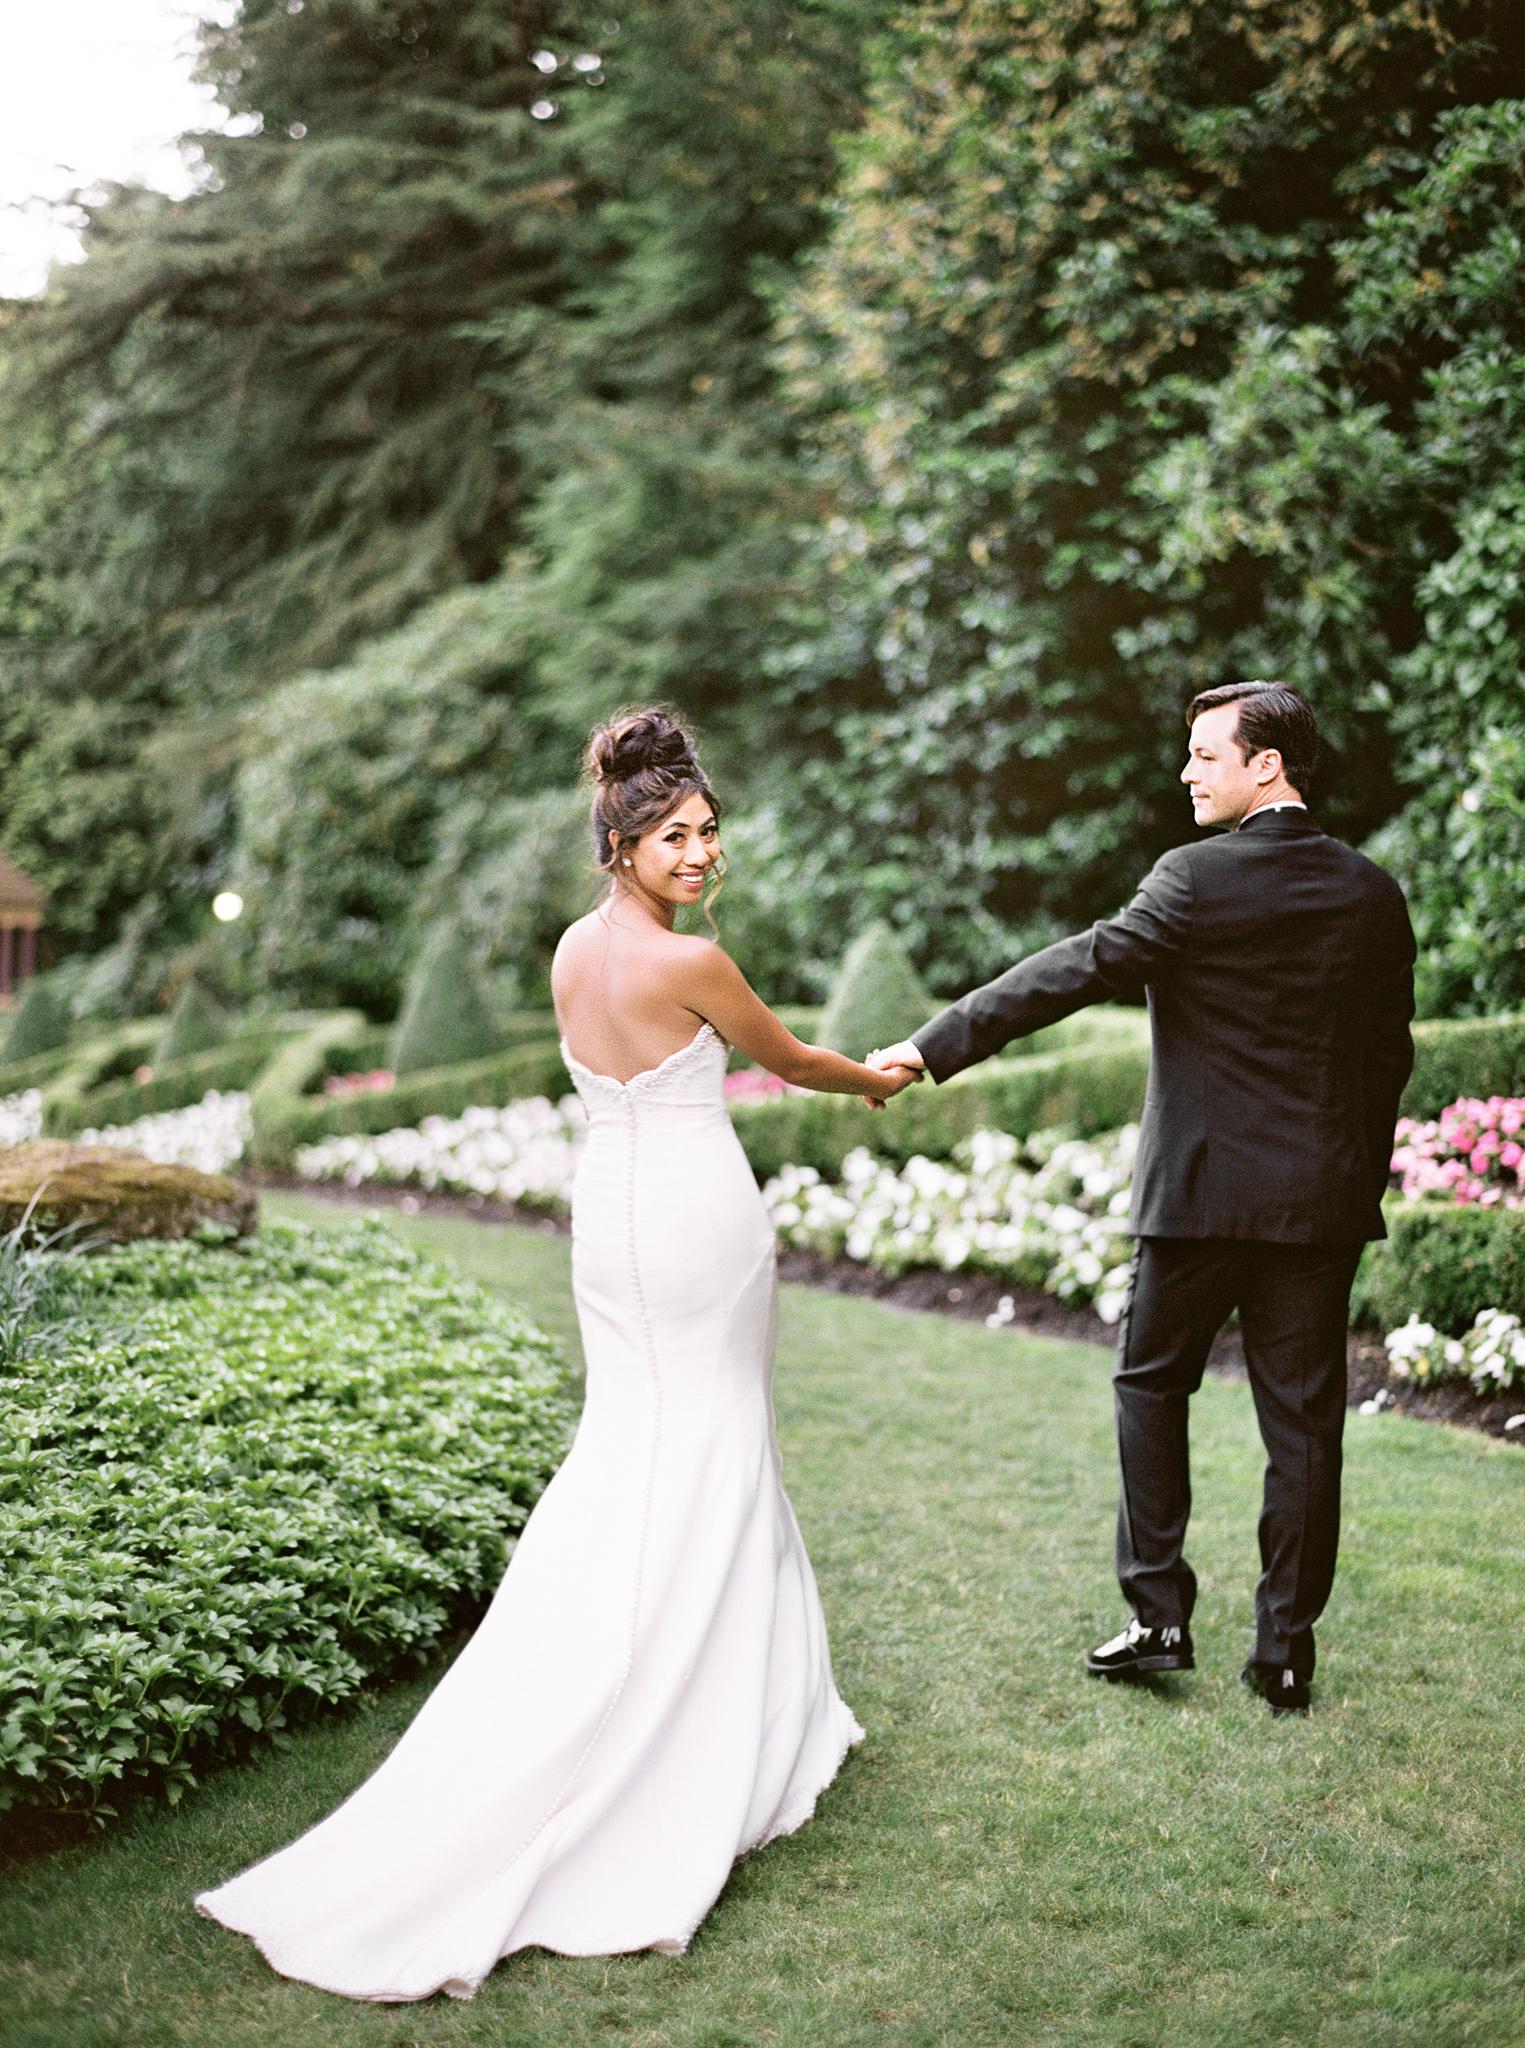 105OutliveCreative_Travel_Photographer_Videographer_Lewis&Clark_Oregon_Elegant_BlackTie_Destination_Wedding.jpg